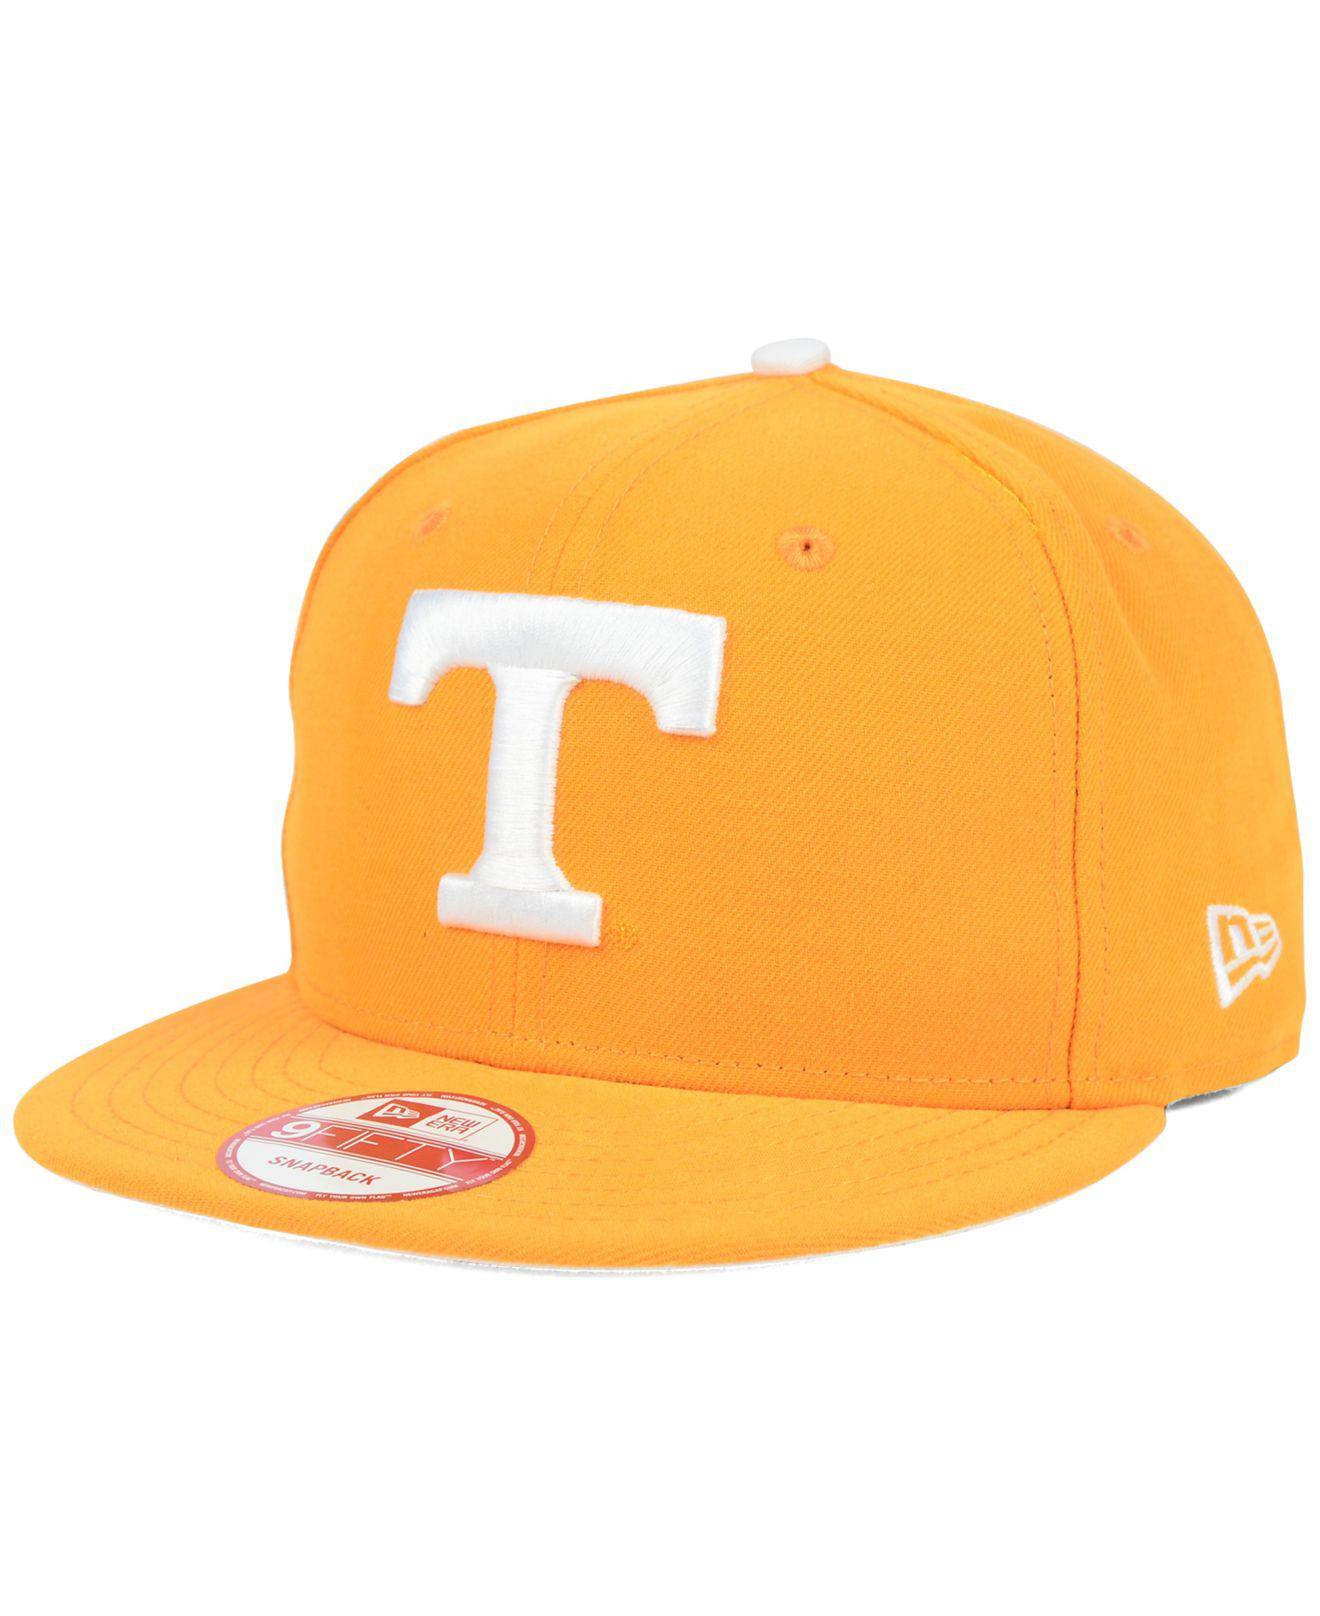 e7331cea9e8 Lyst - KTZ Tennessee Volunteers Core 9fifty Snapback Cap in Orange ...